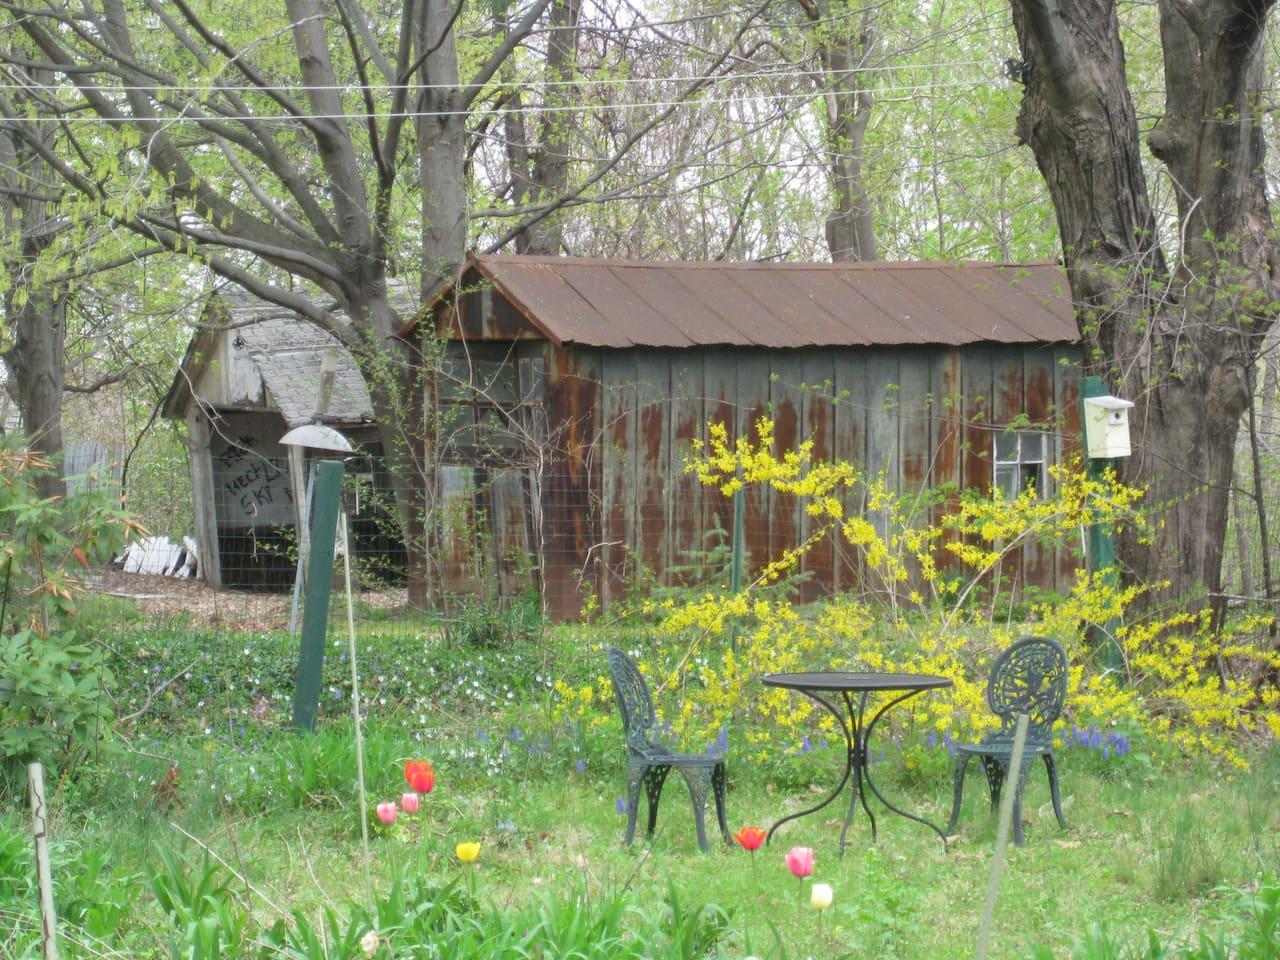 Toward the back of the garden at Clover Nook, early spring